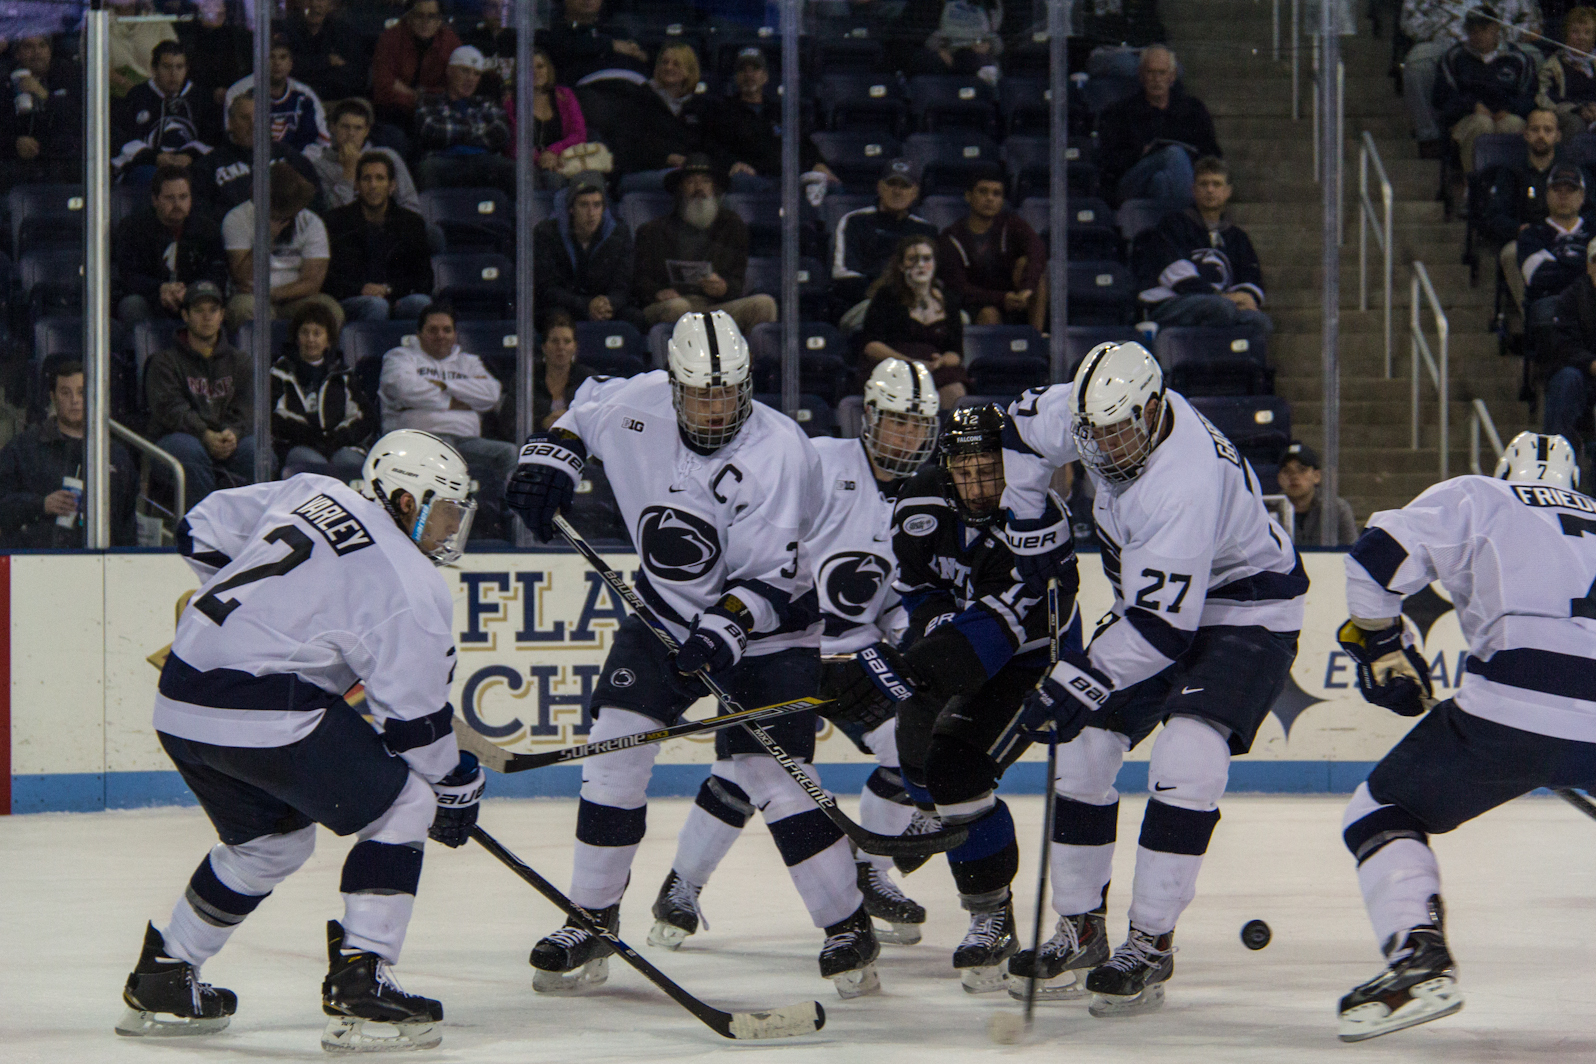 PSU Hockey vs. Bentley -17